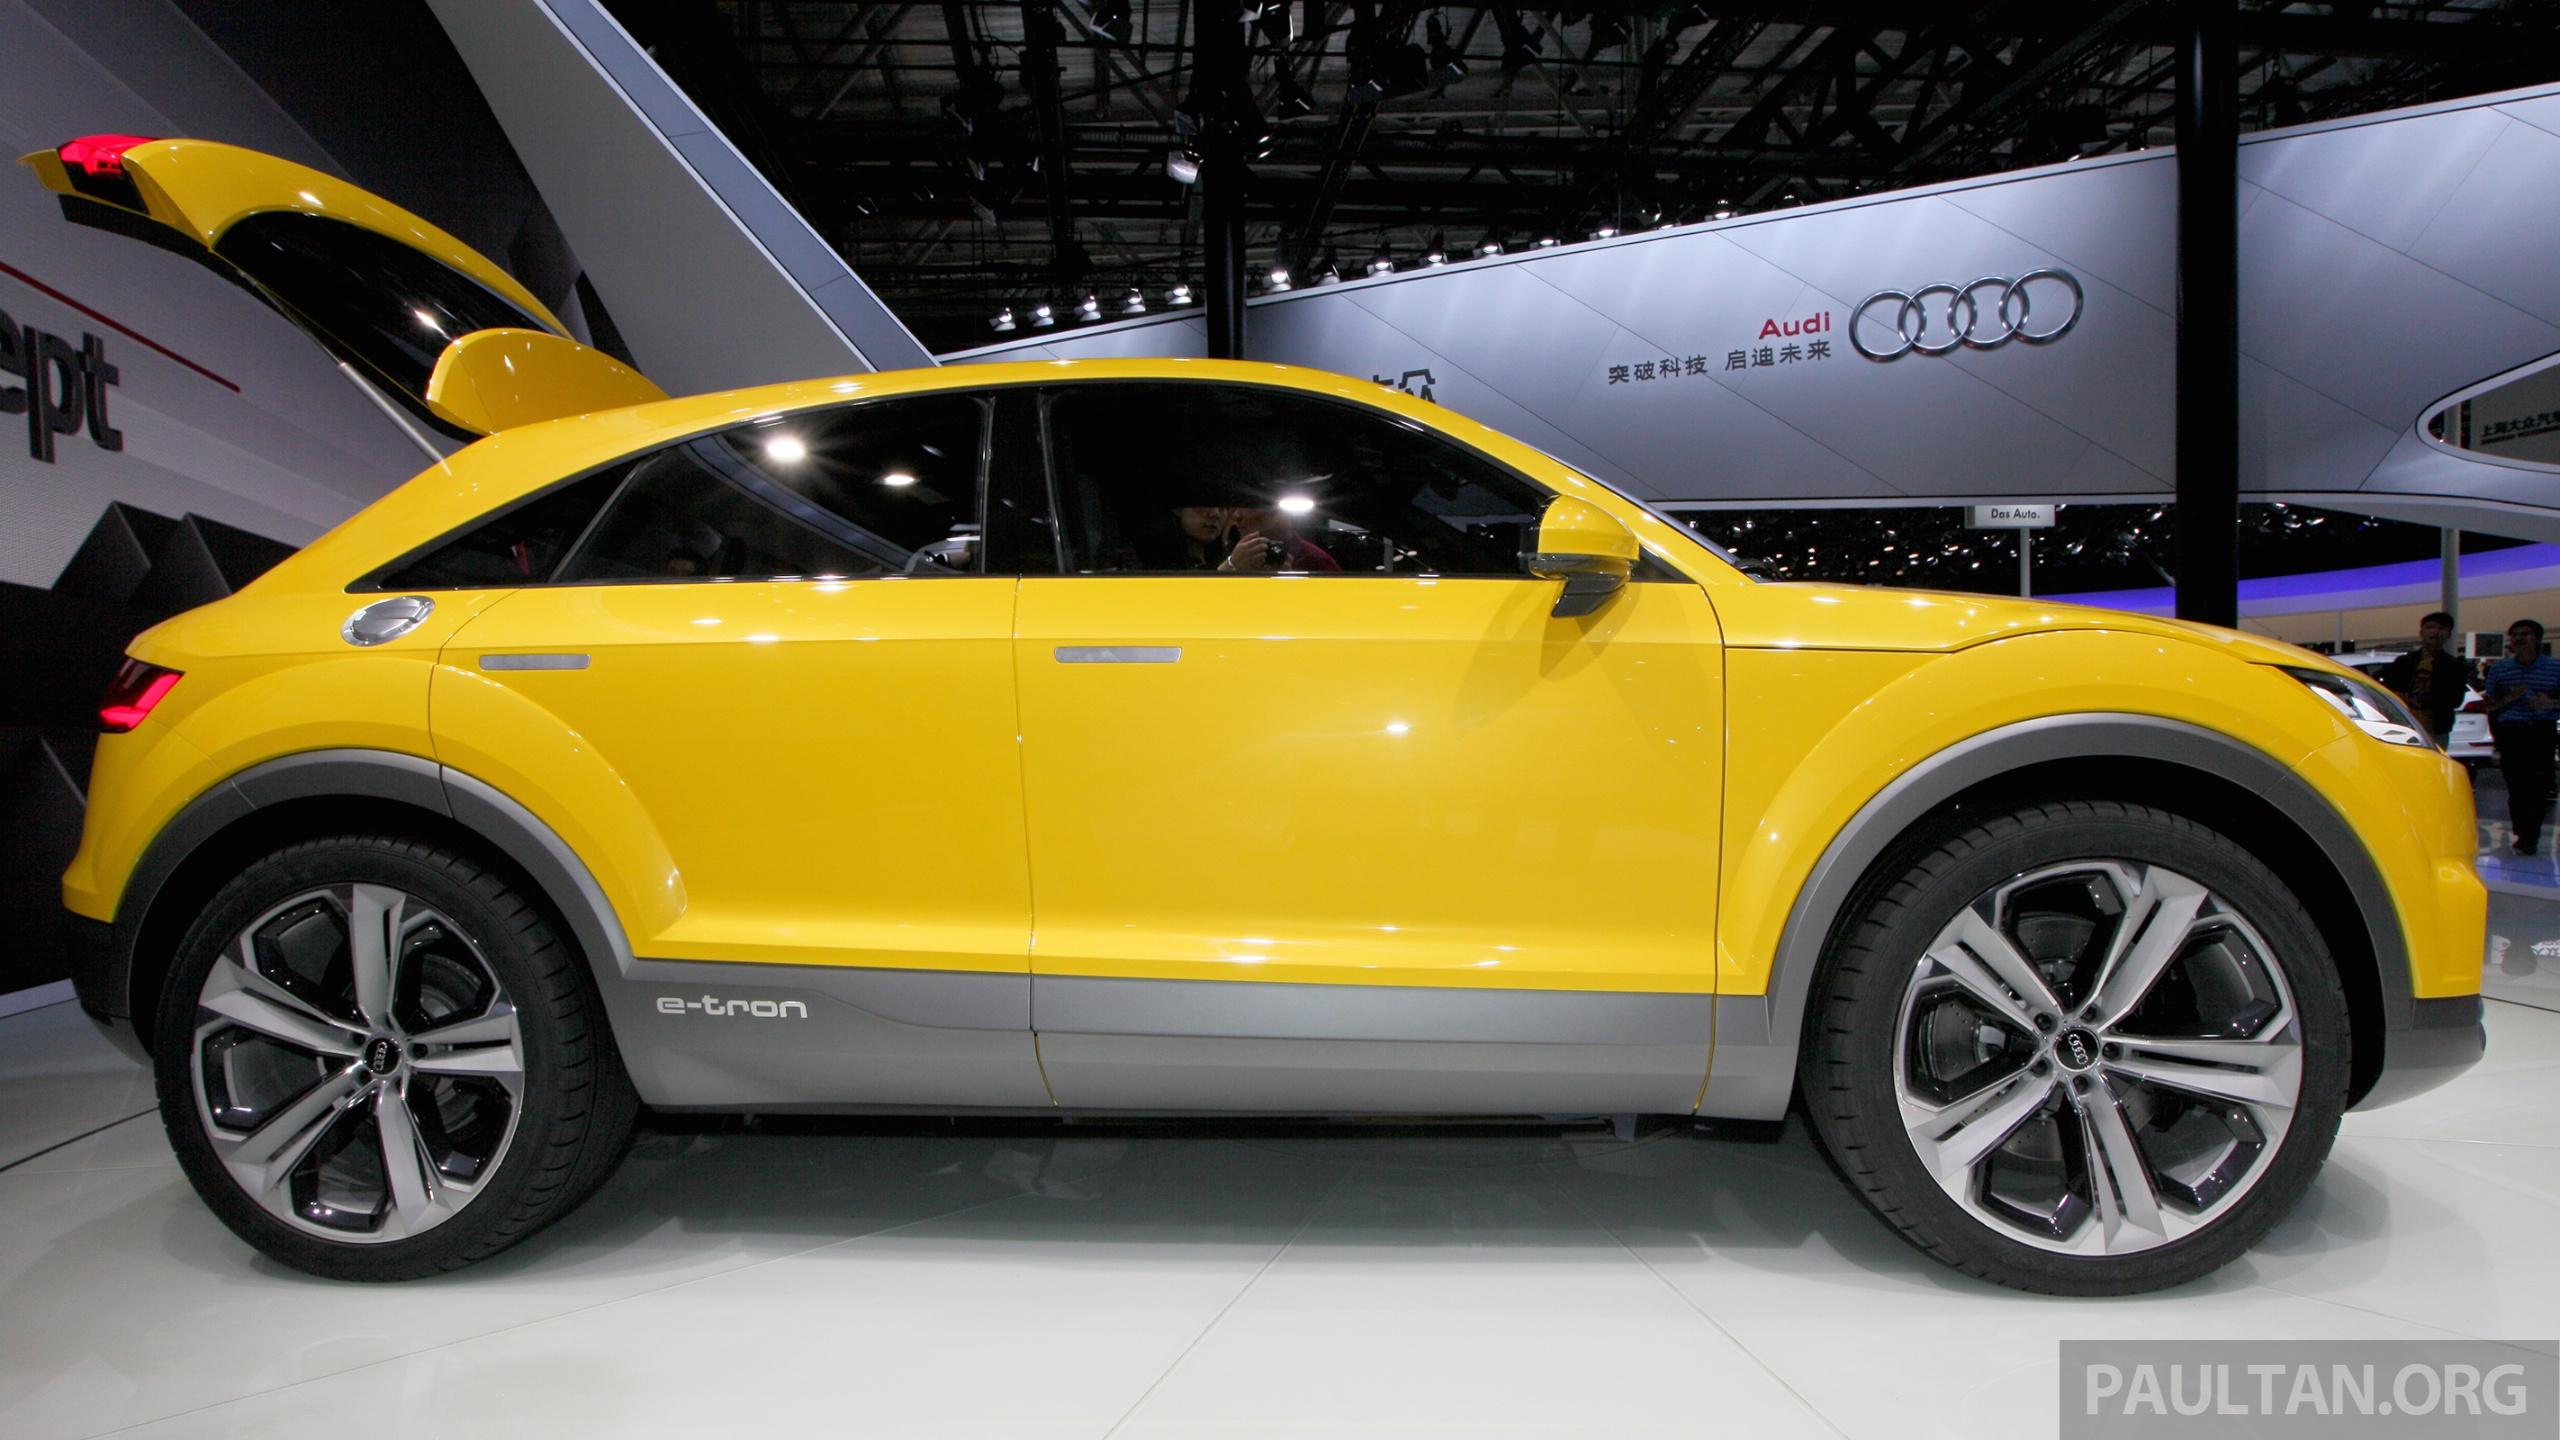 Audi 确认增加两款新suv,q4 与 Q8 两年内陆续面世。 Audi Tt Offroad Concept